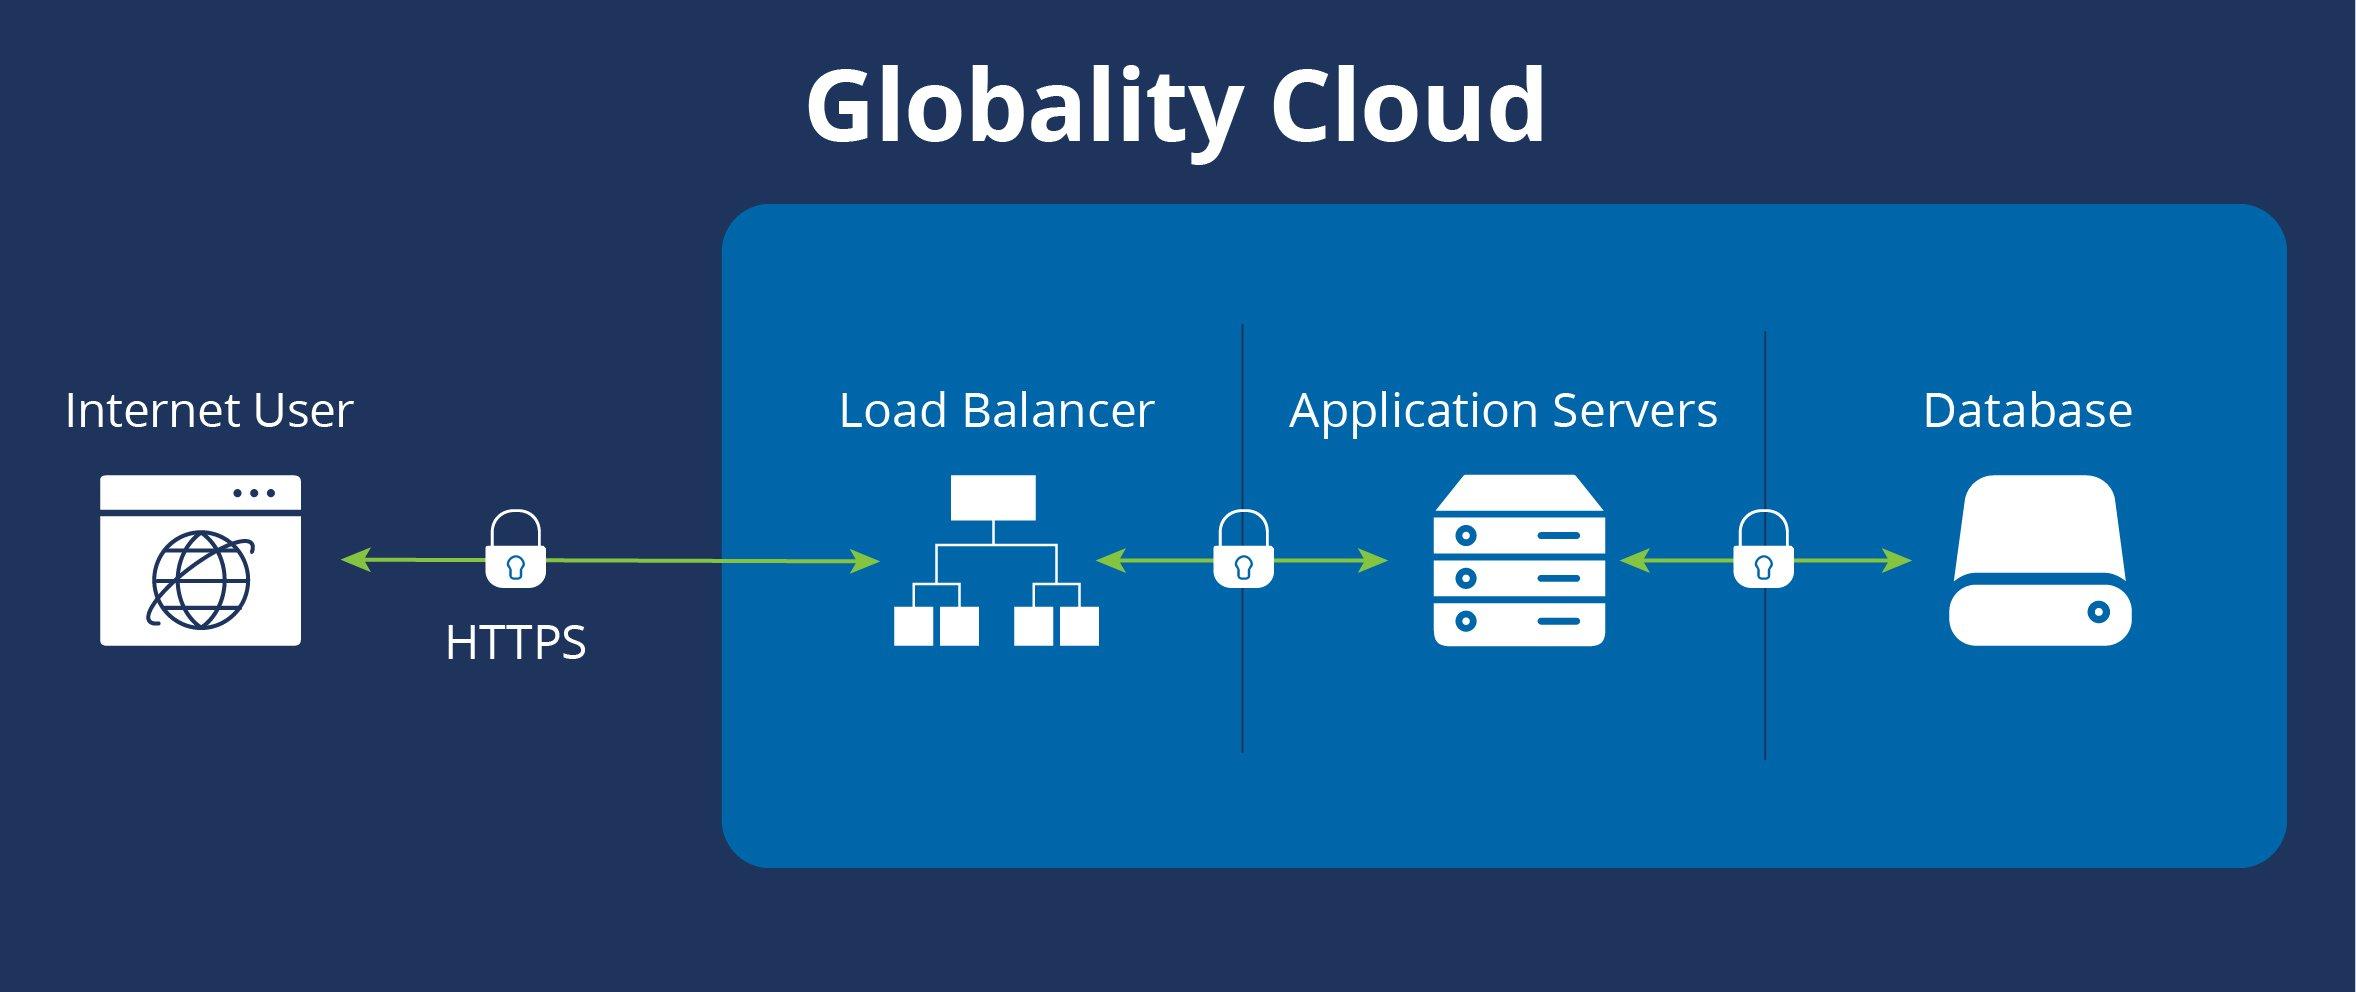 Globality Cloud